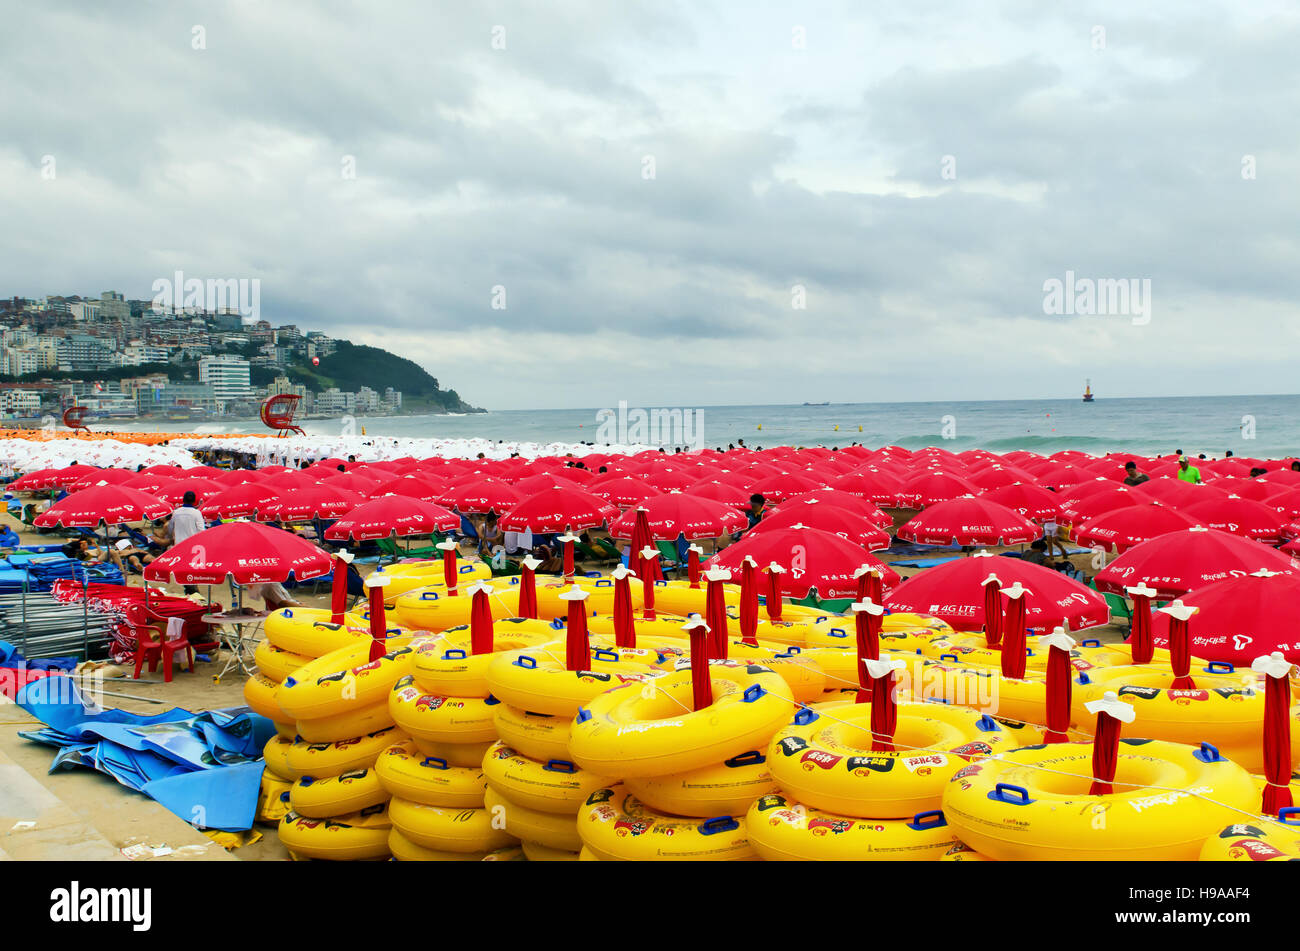 Busan, South Korea - 6 August 2011:  Haueundae beach full of umbrellas during it's peak season as a storm rolls - Stock Image